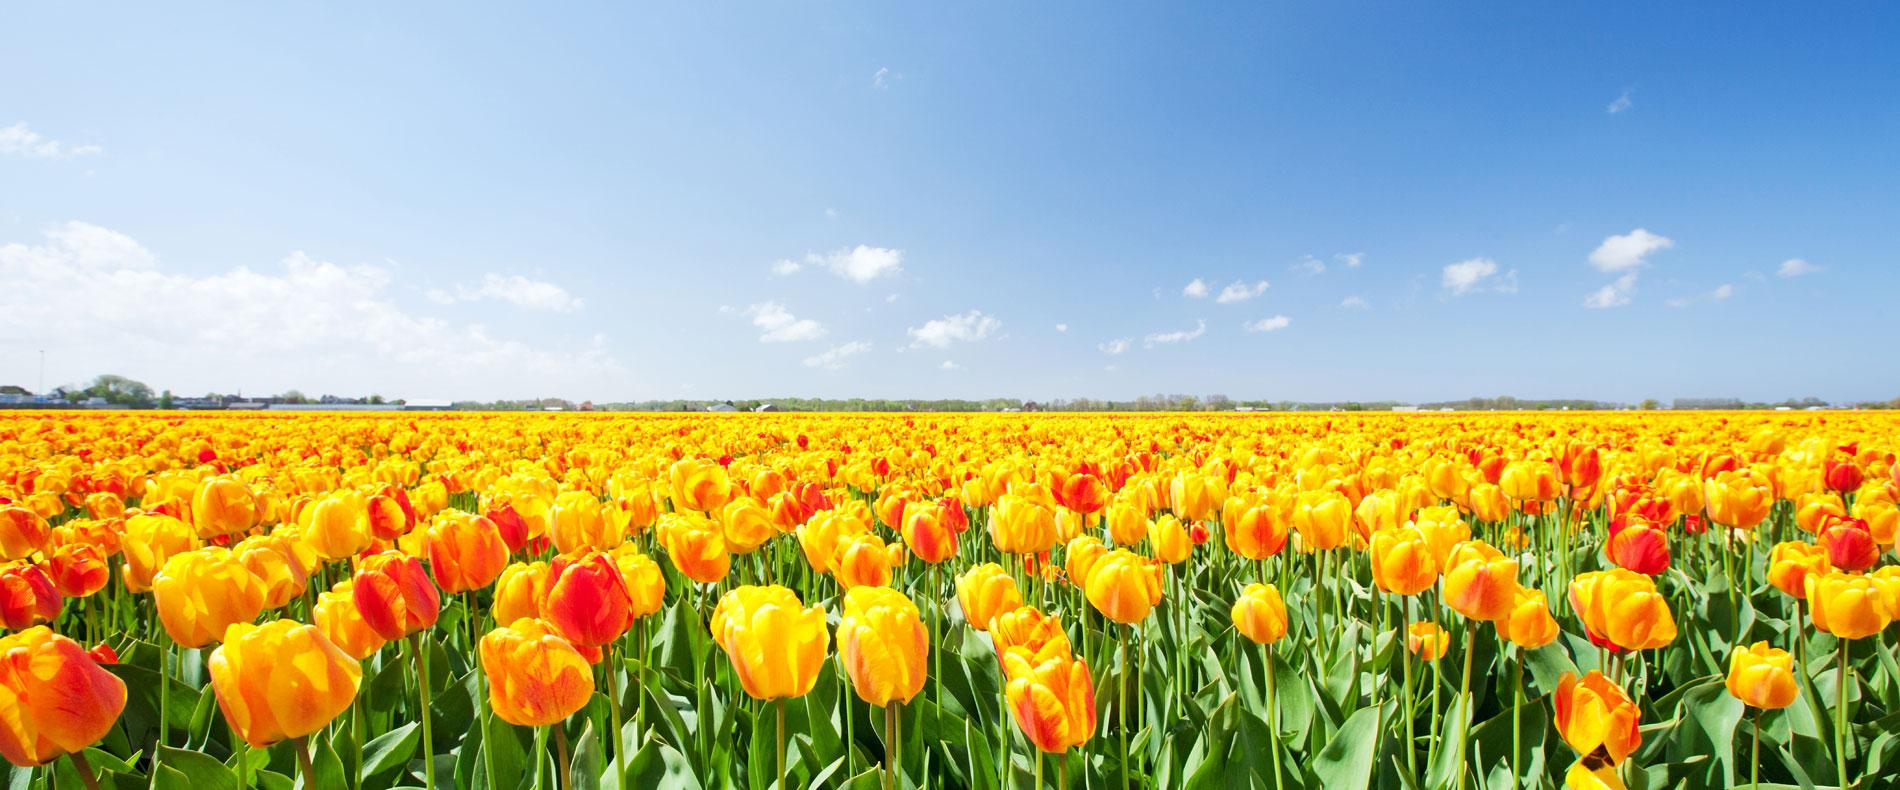 Bunga Tulip yang cantik dan indah. Serbalanda Eka Tanjung wisata Belanda